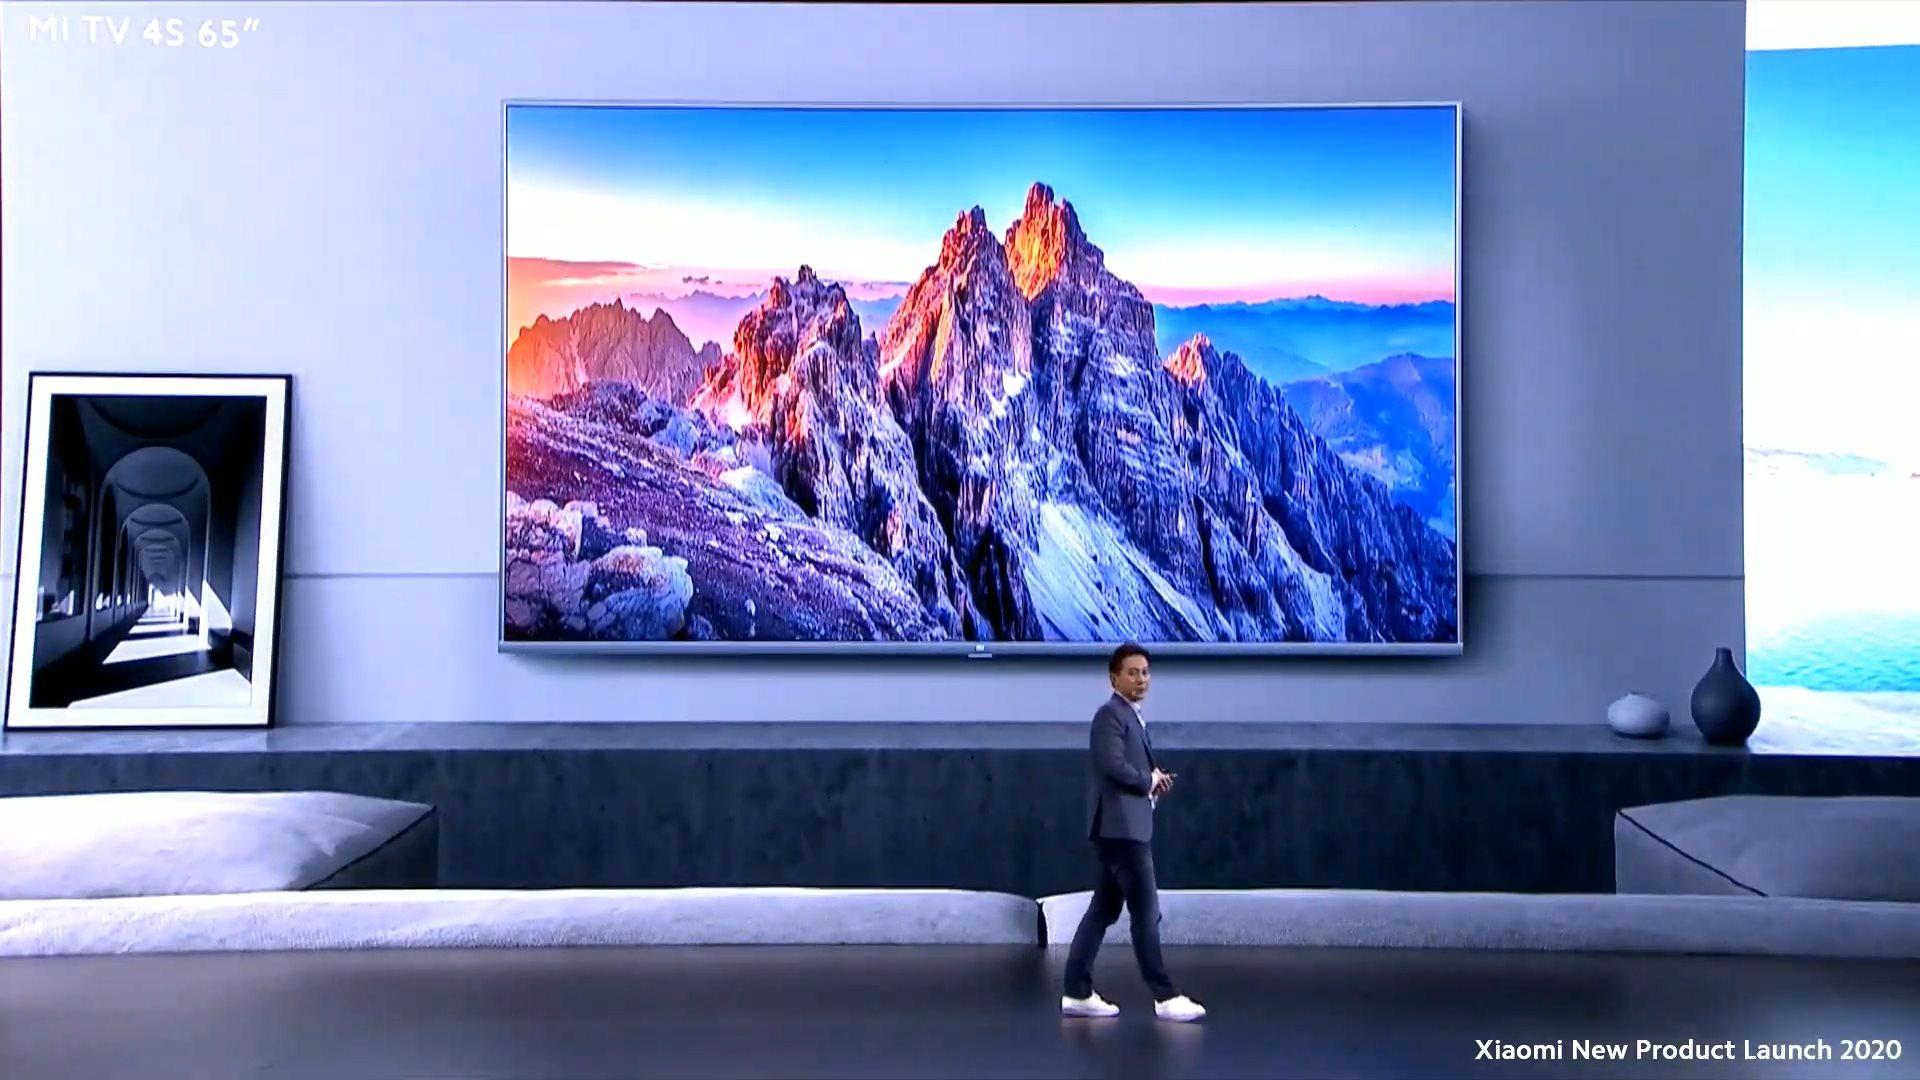 La Xiaomi Mi TV 4S 65″ arrive en France à prix canon